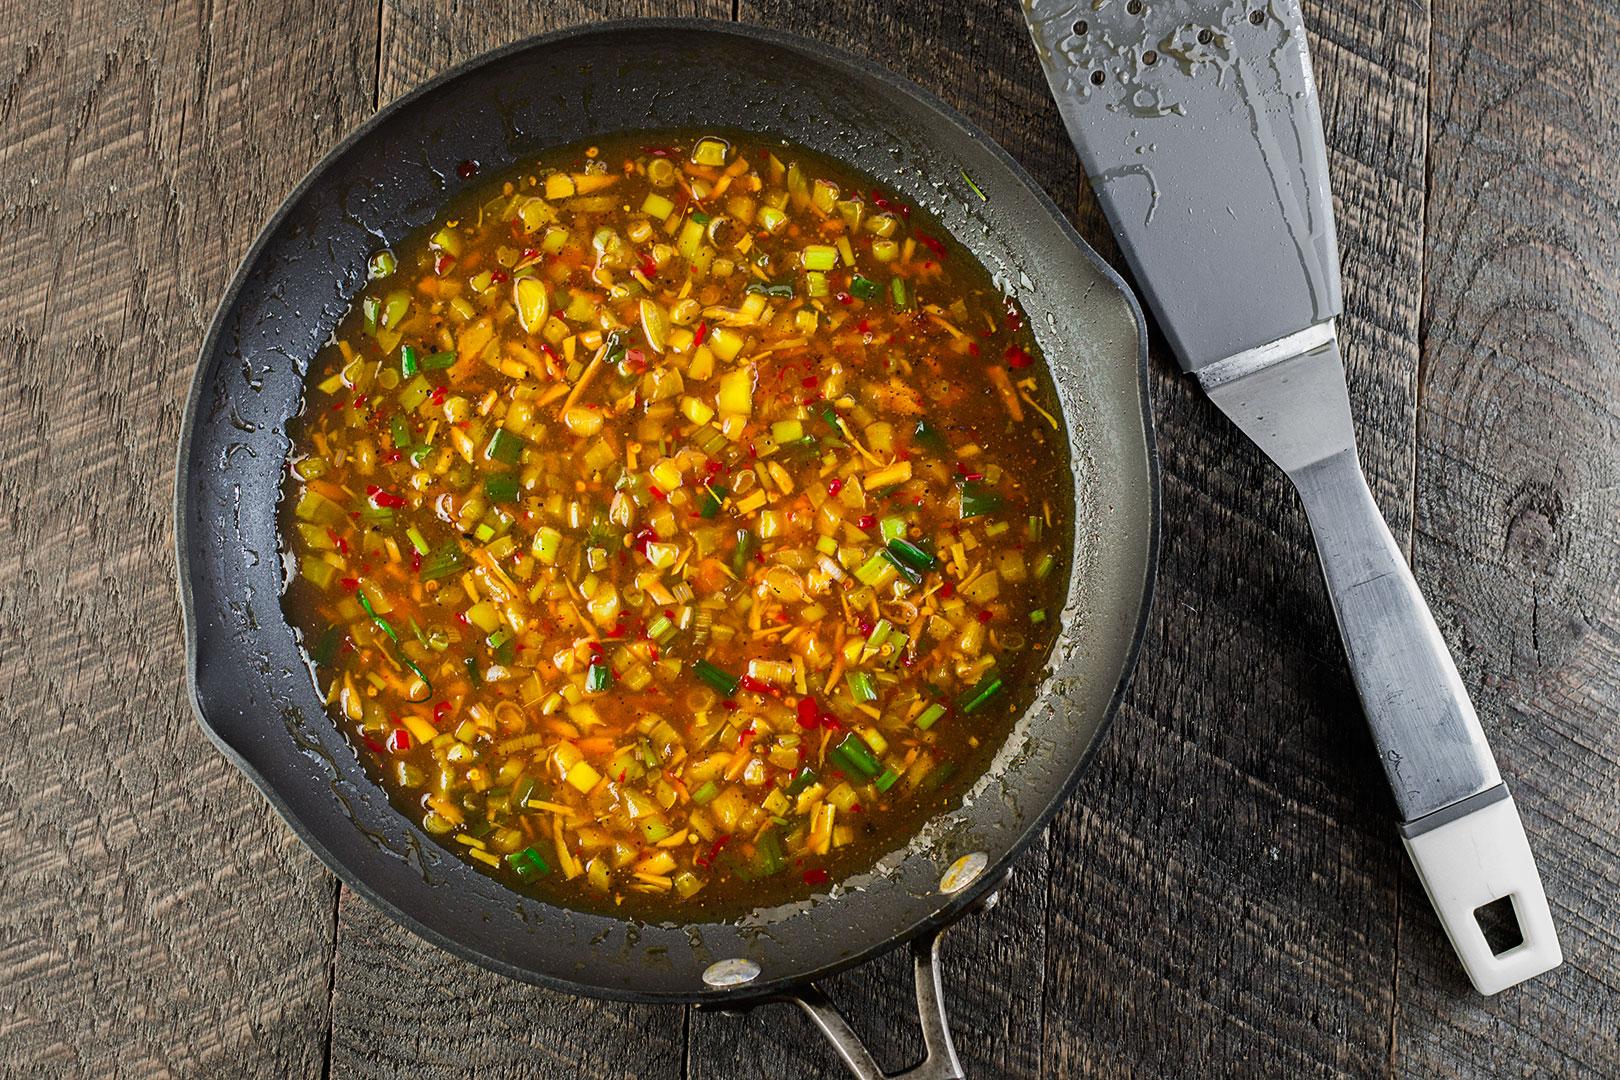 The sweet chili sauce